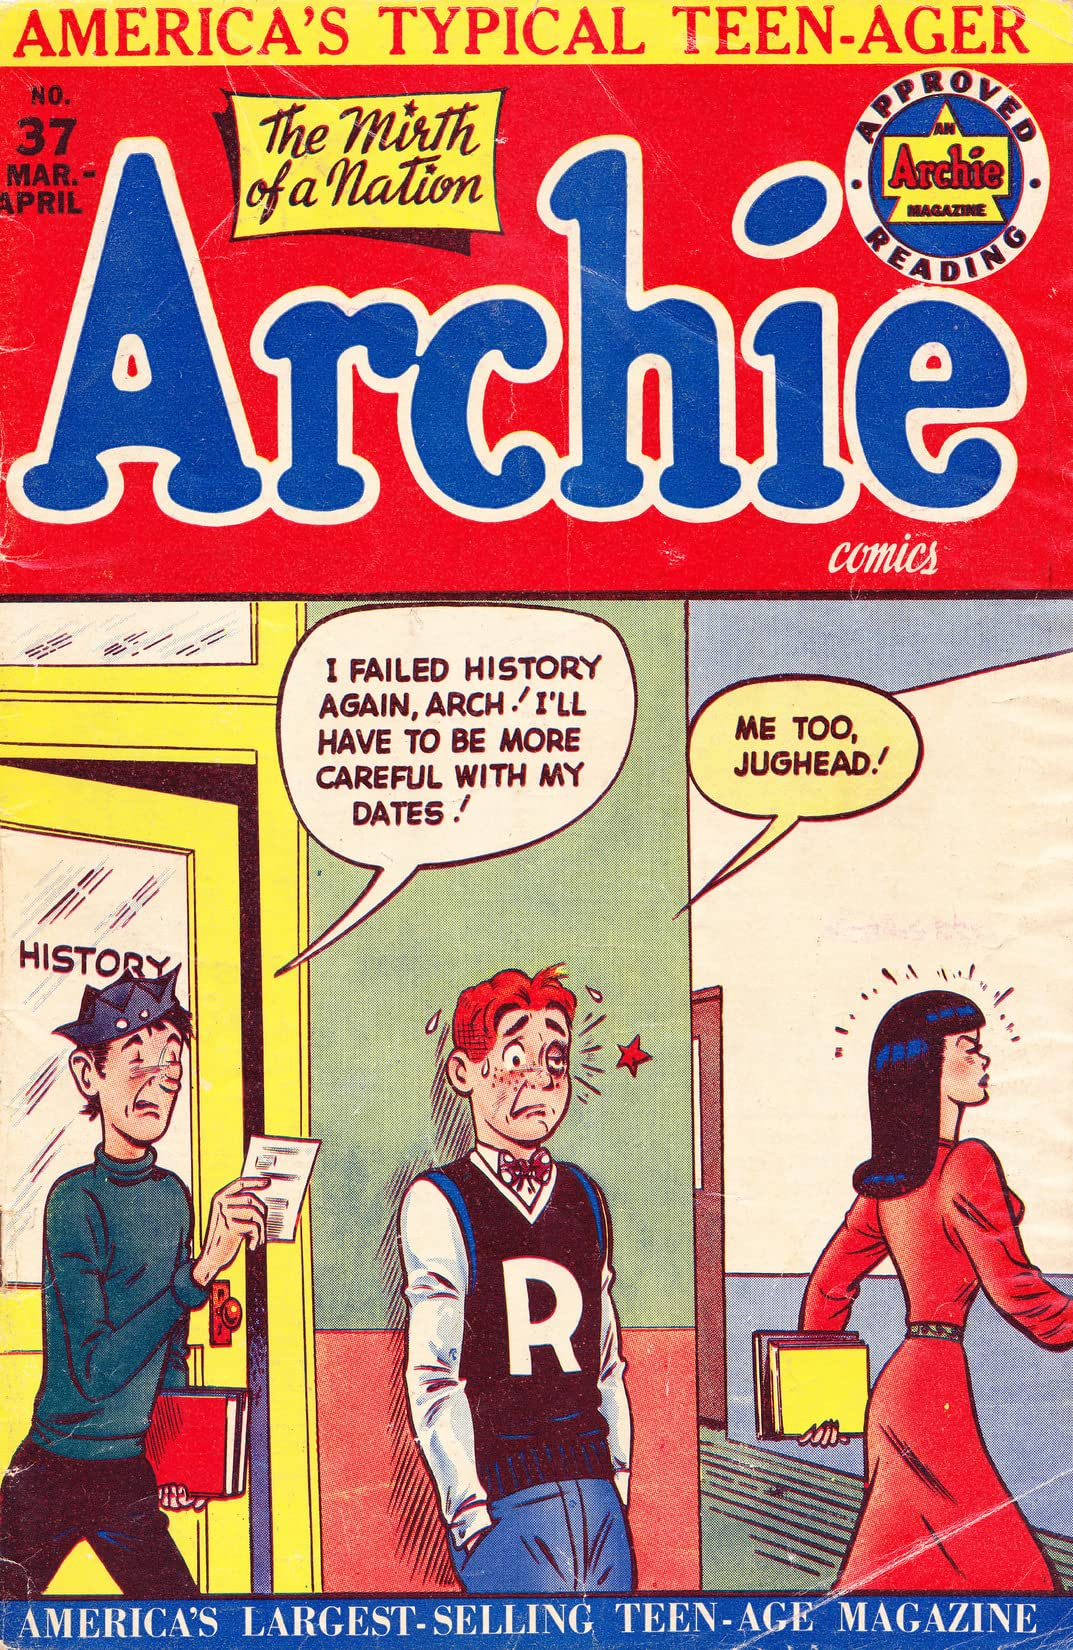 Archie #37